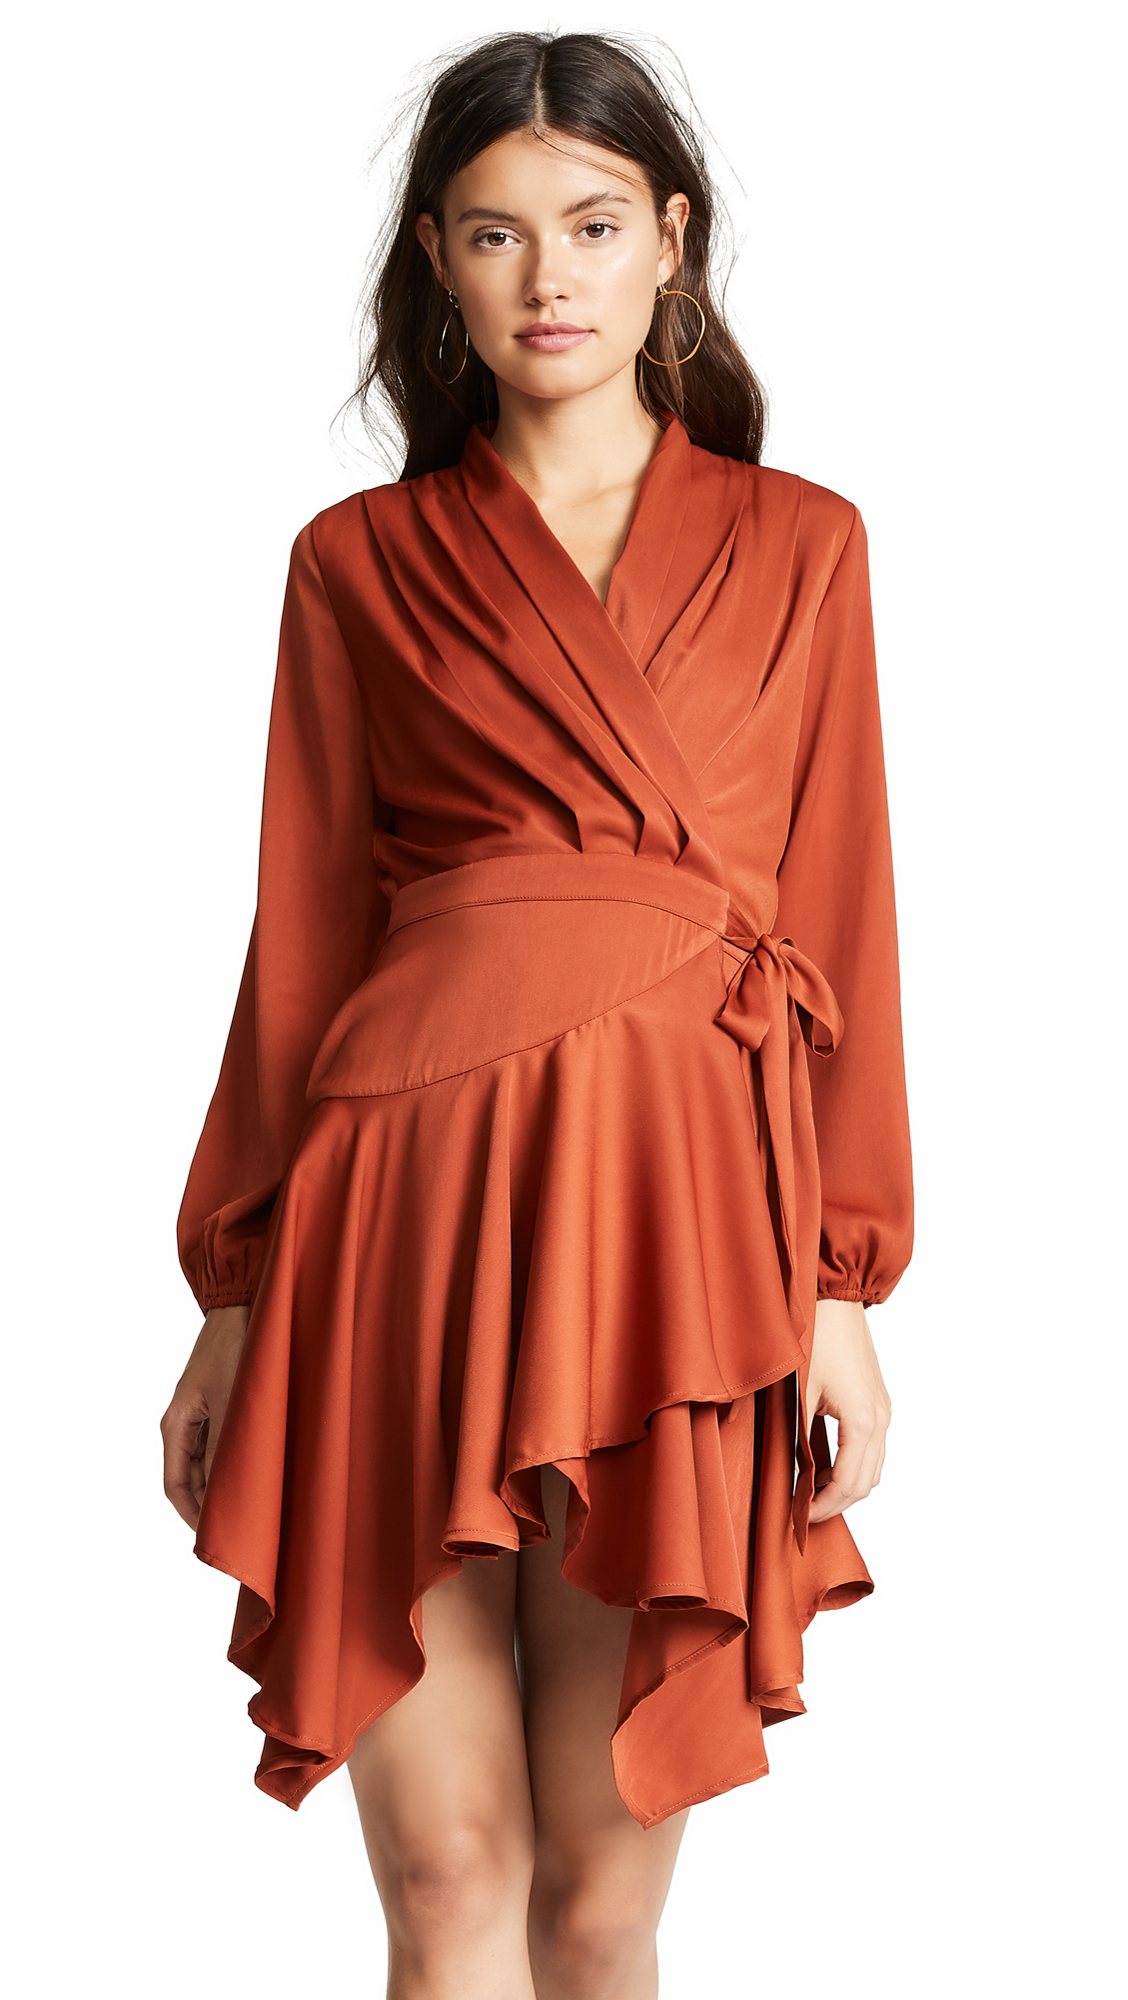 dRA Villagio Dress